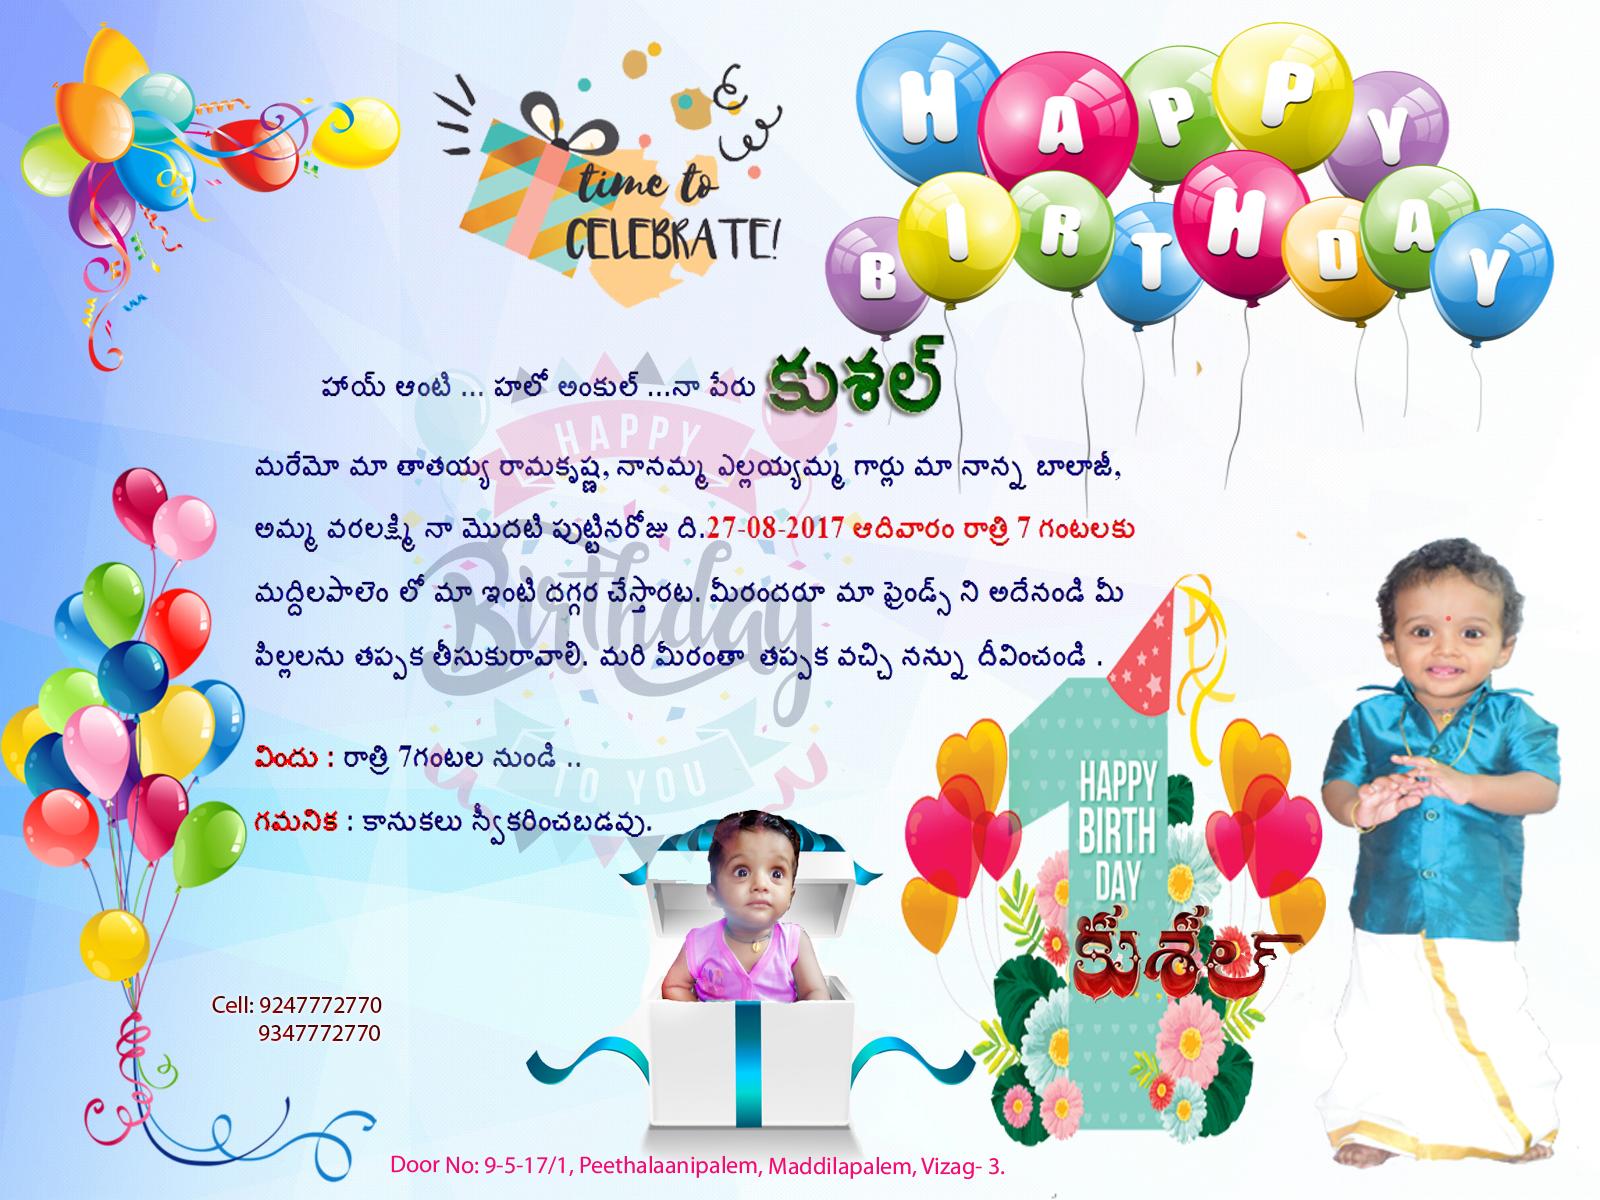 Pilla kushal first birthday invitation card deisgn sample best pilla kushal first birthday invitation card deisgn sample filmwisefo